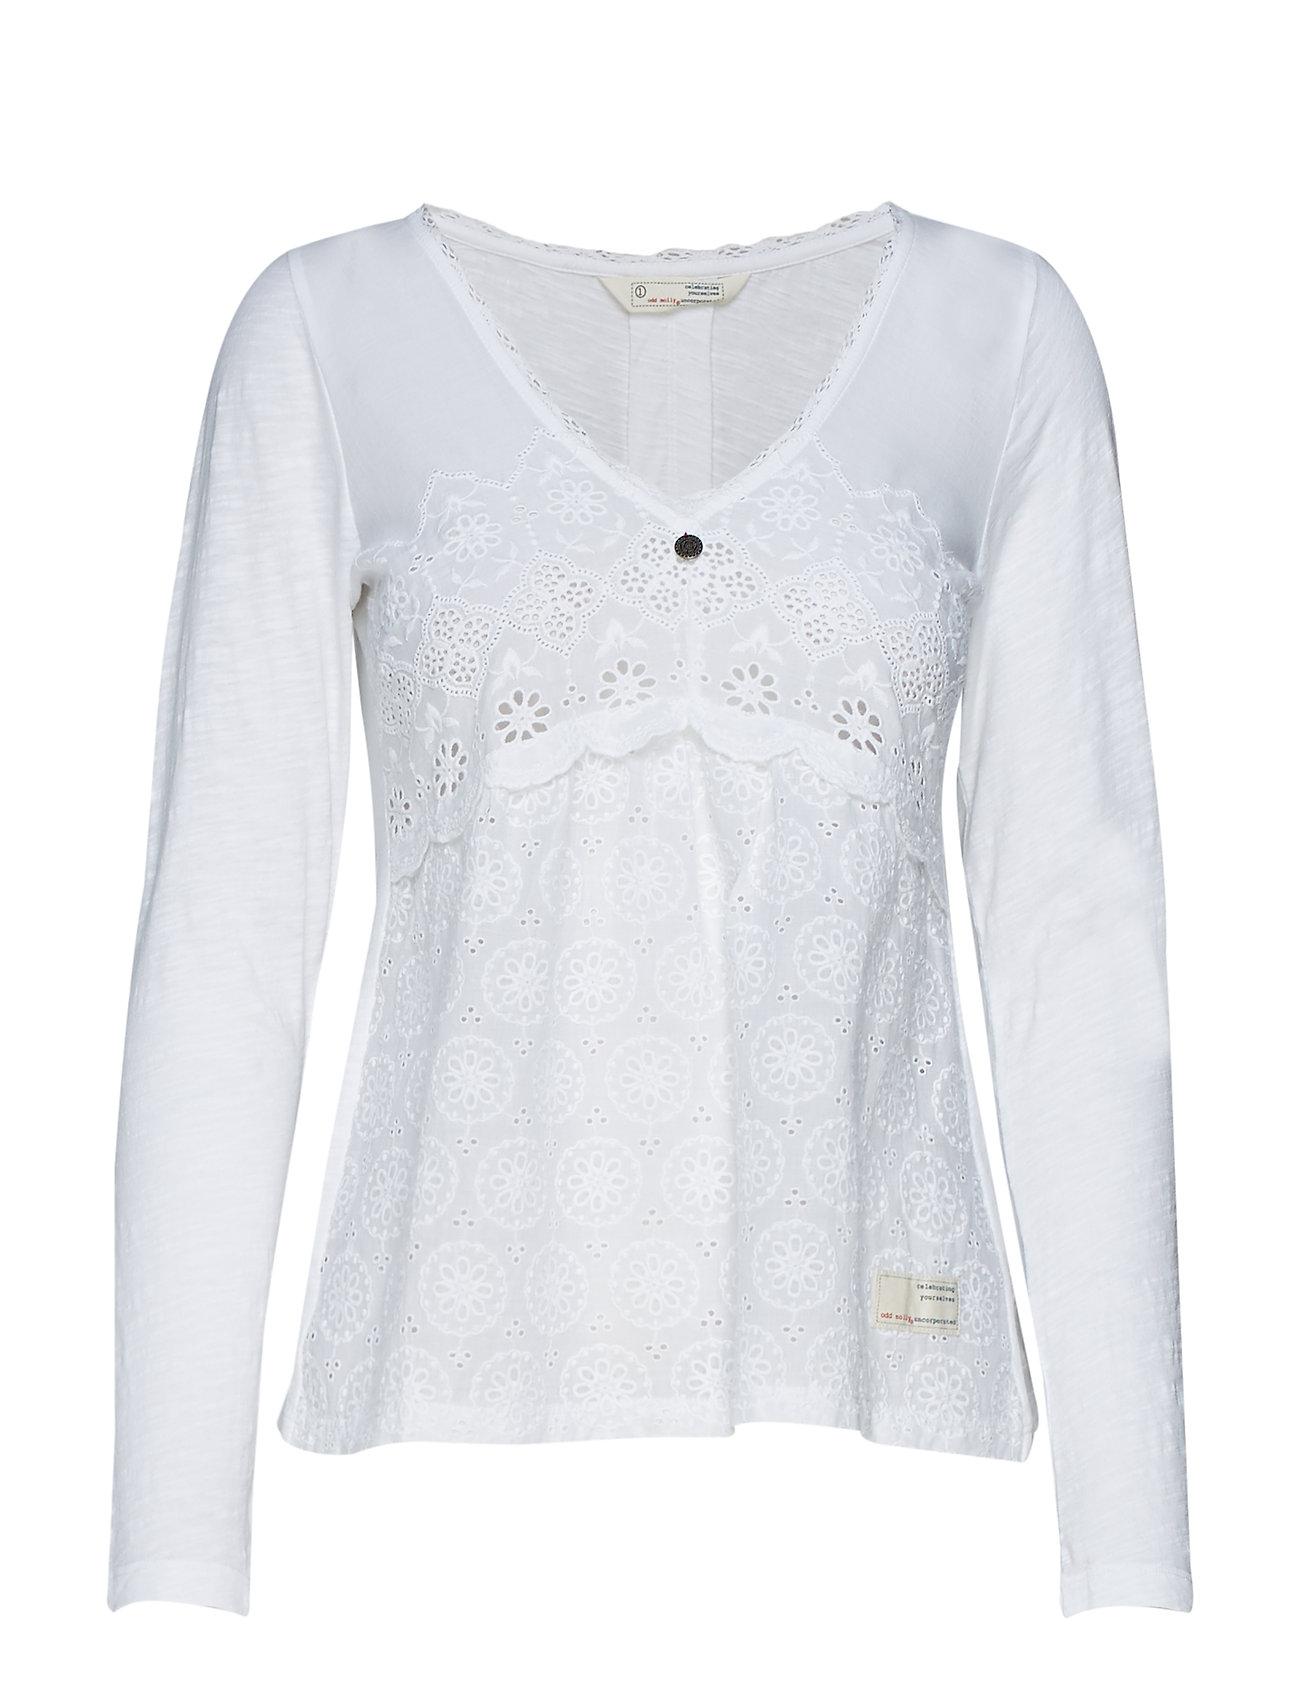 2d0d1ca2 Circular Blouse (Bright White) (556.50 kr) - ODD MOLLY - | Boozt.com